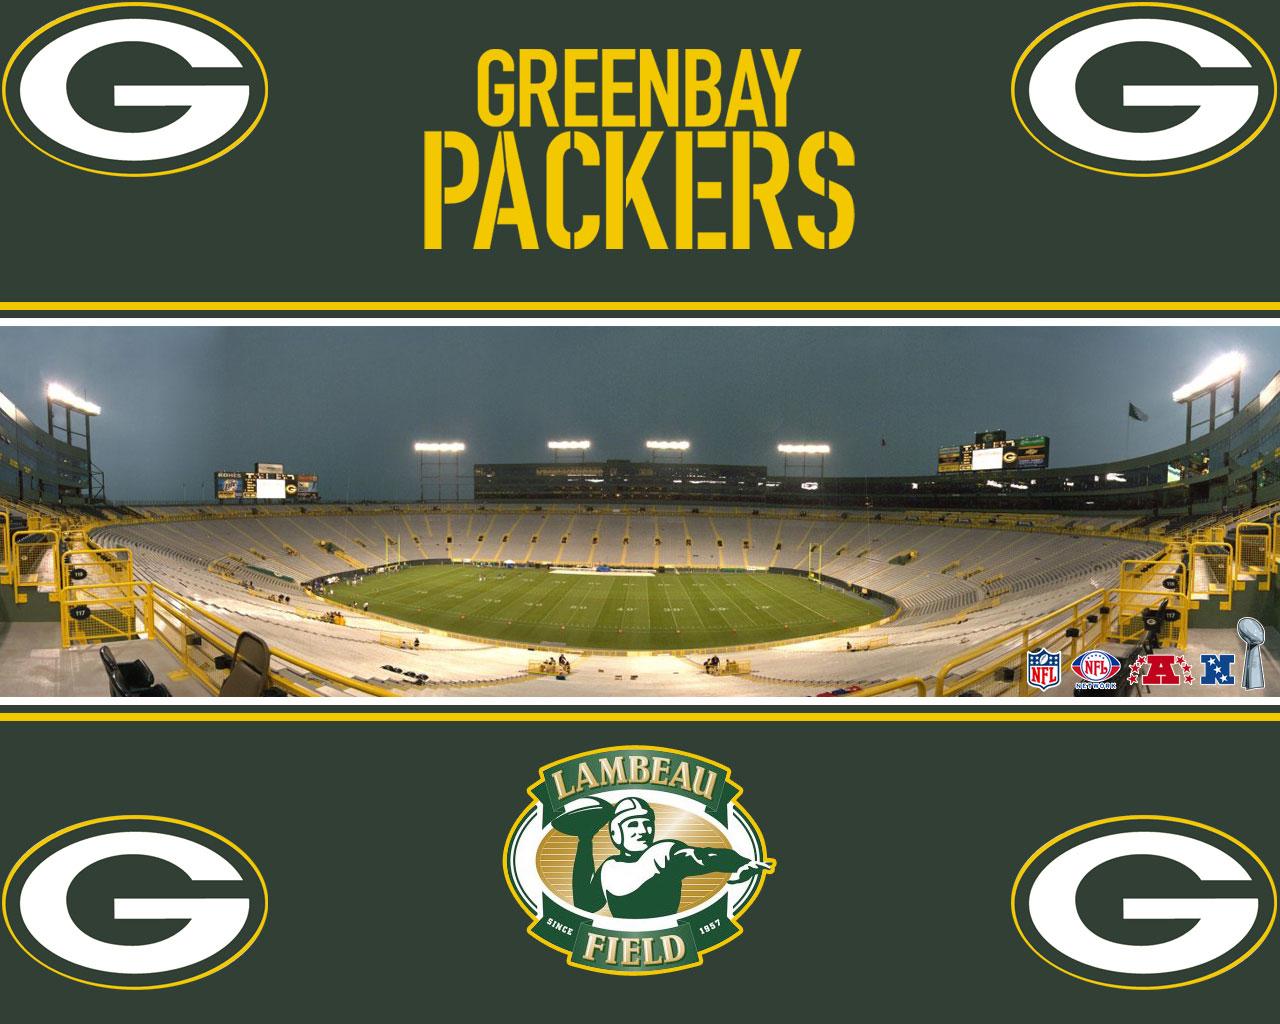 http://4.bp.blogspot.com/_SPY5-z18DBU/TTBGDuebCVI/AAAAAAAAAKc/T_dyKvCbY2I/s1600/greenbay_packers_wallpaper_stadium_lambeau_field_1280x1024.jpeg